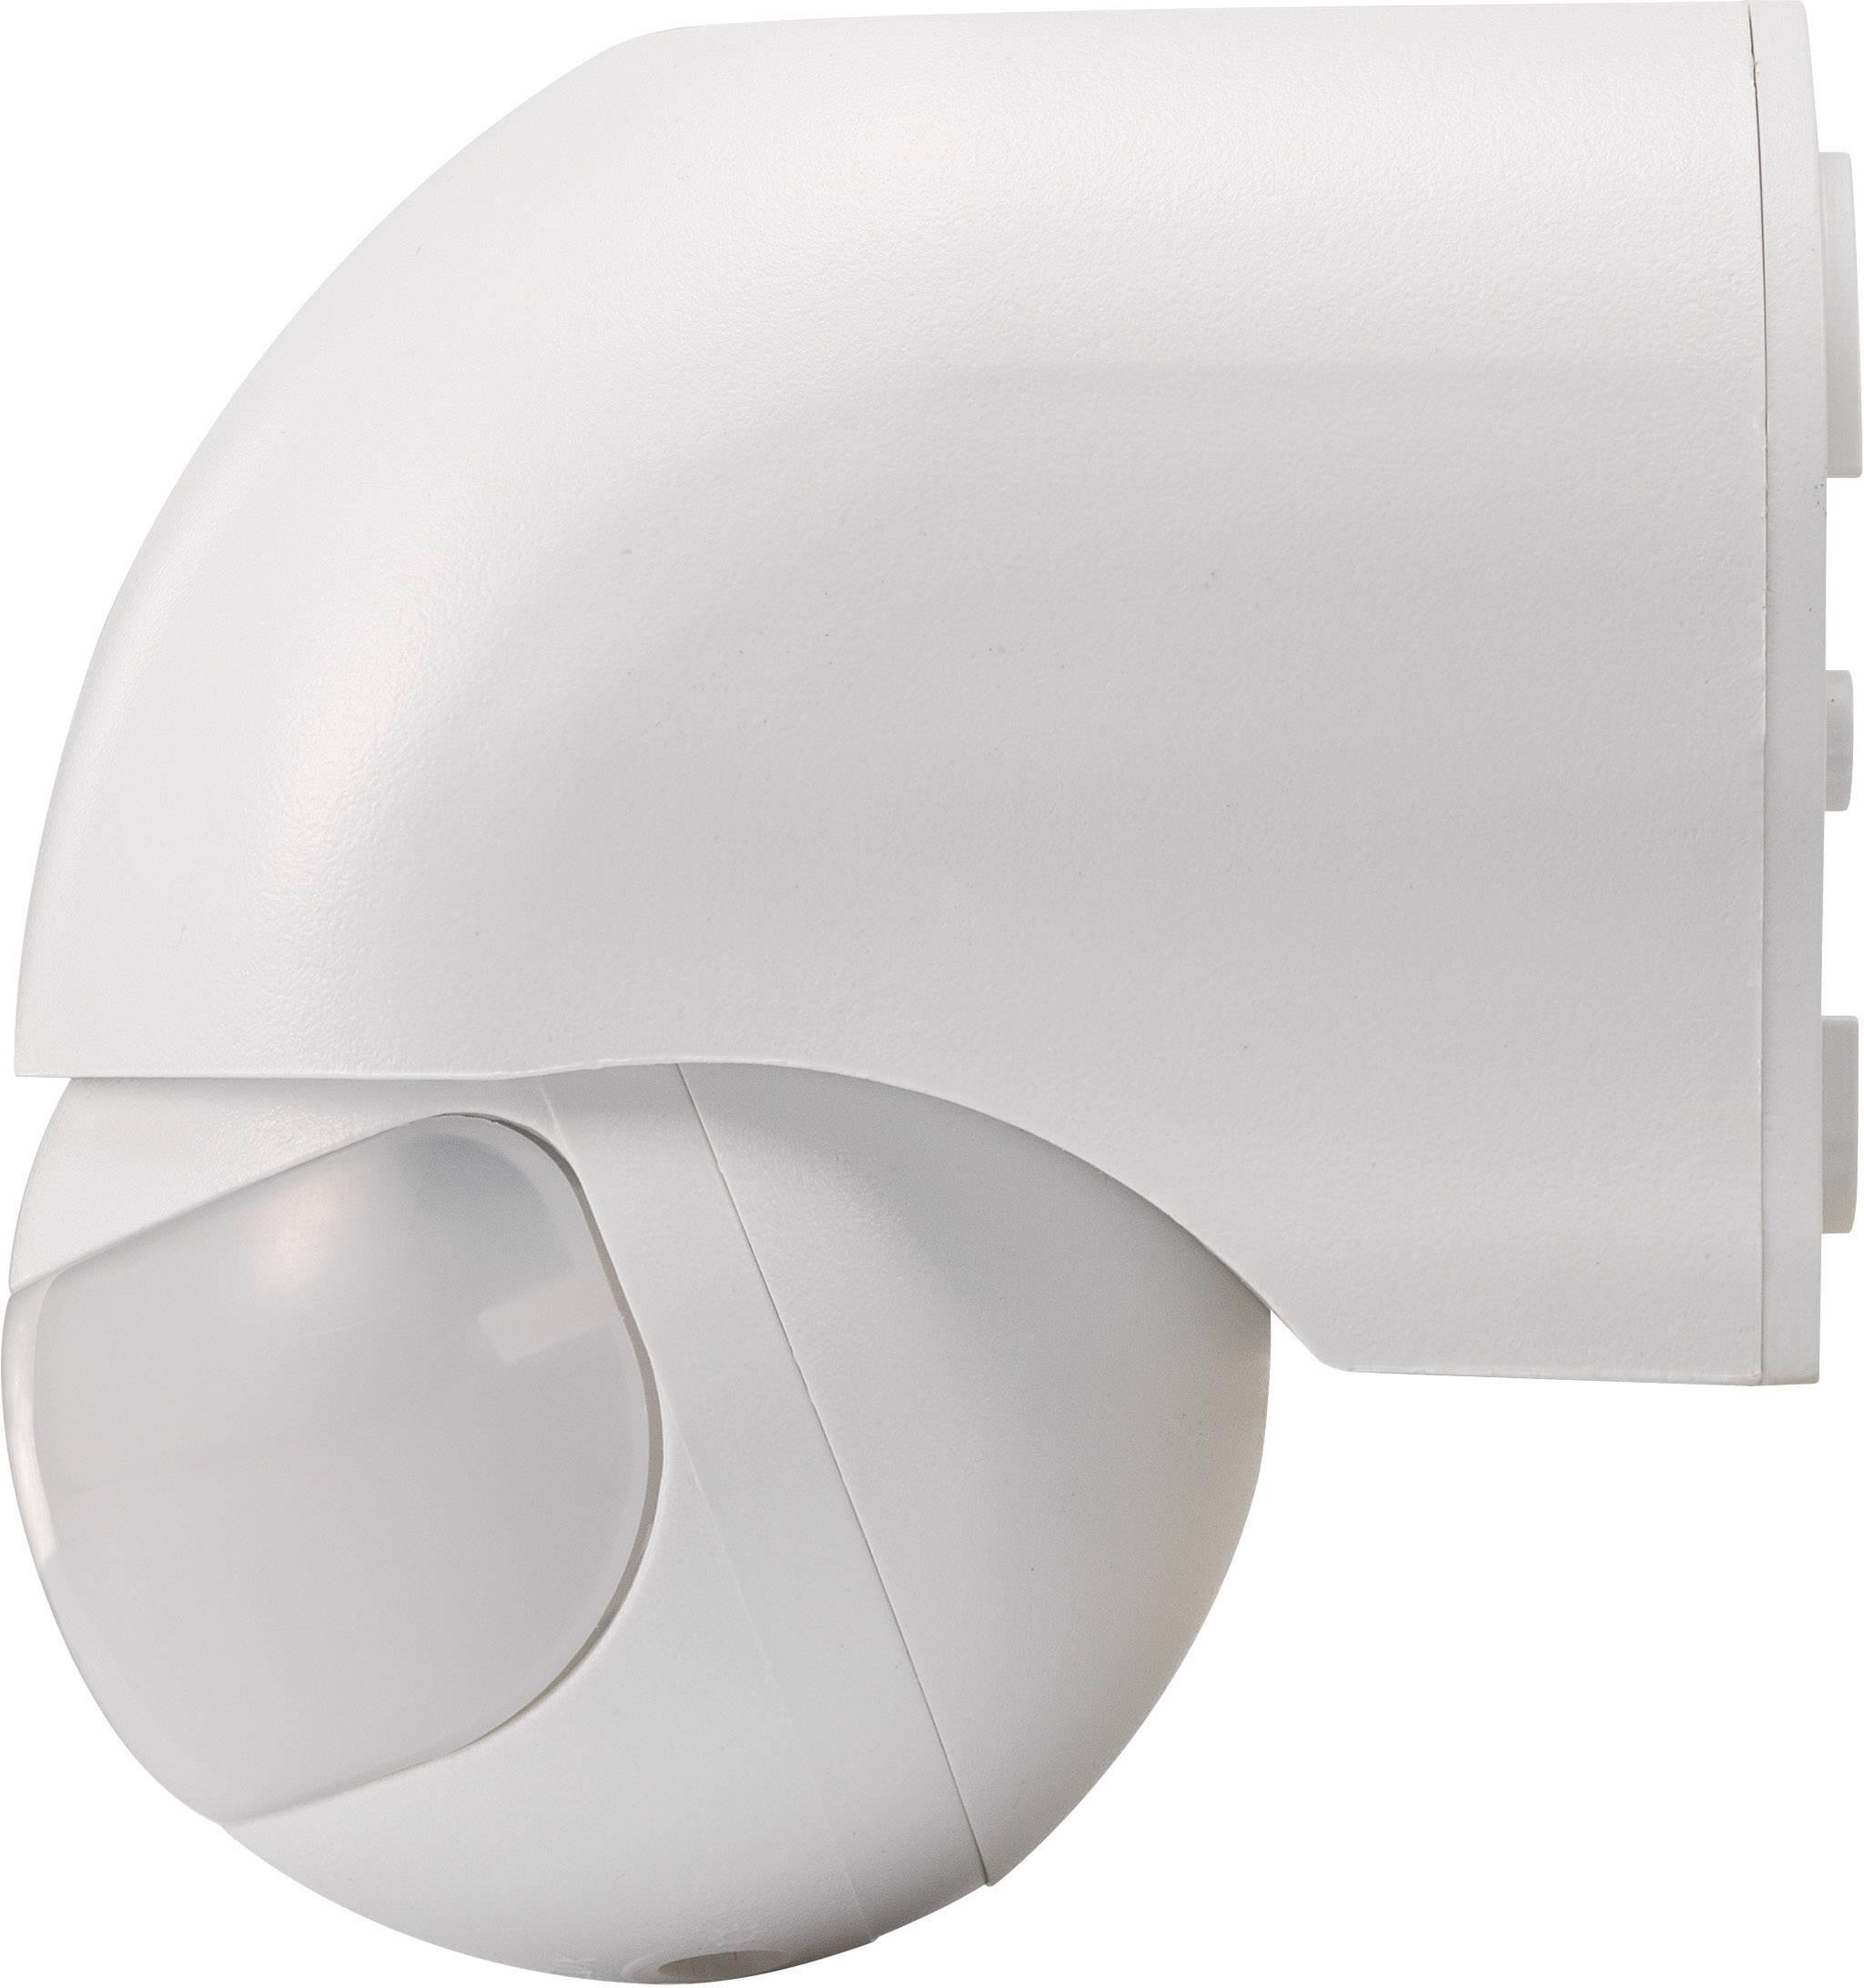 Detektor pohybu PIR Renkforce 1034069, 160 °, relé, bílá, IP44